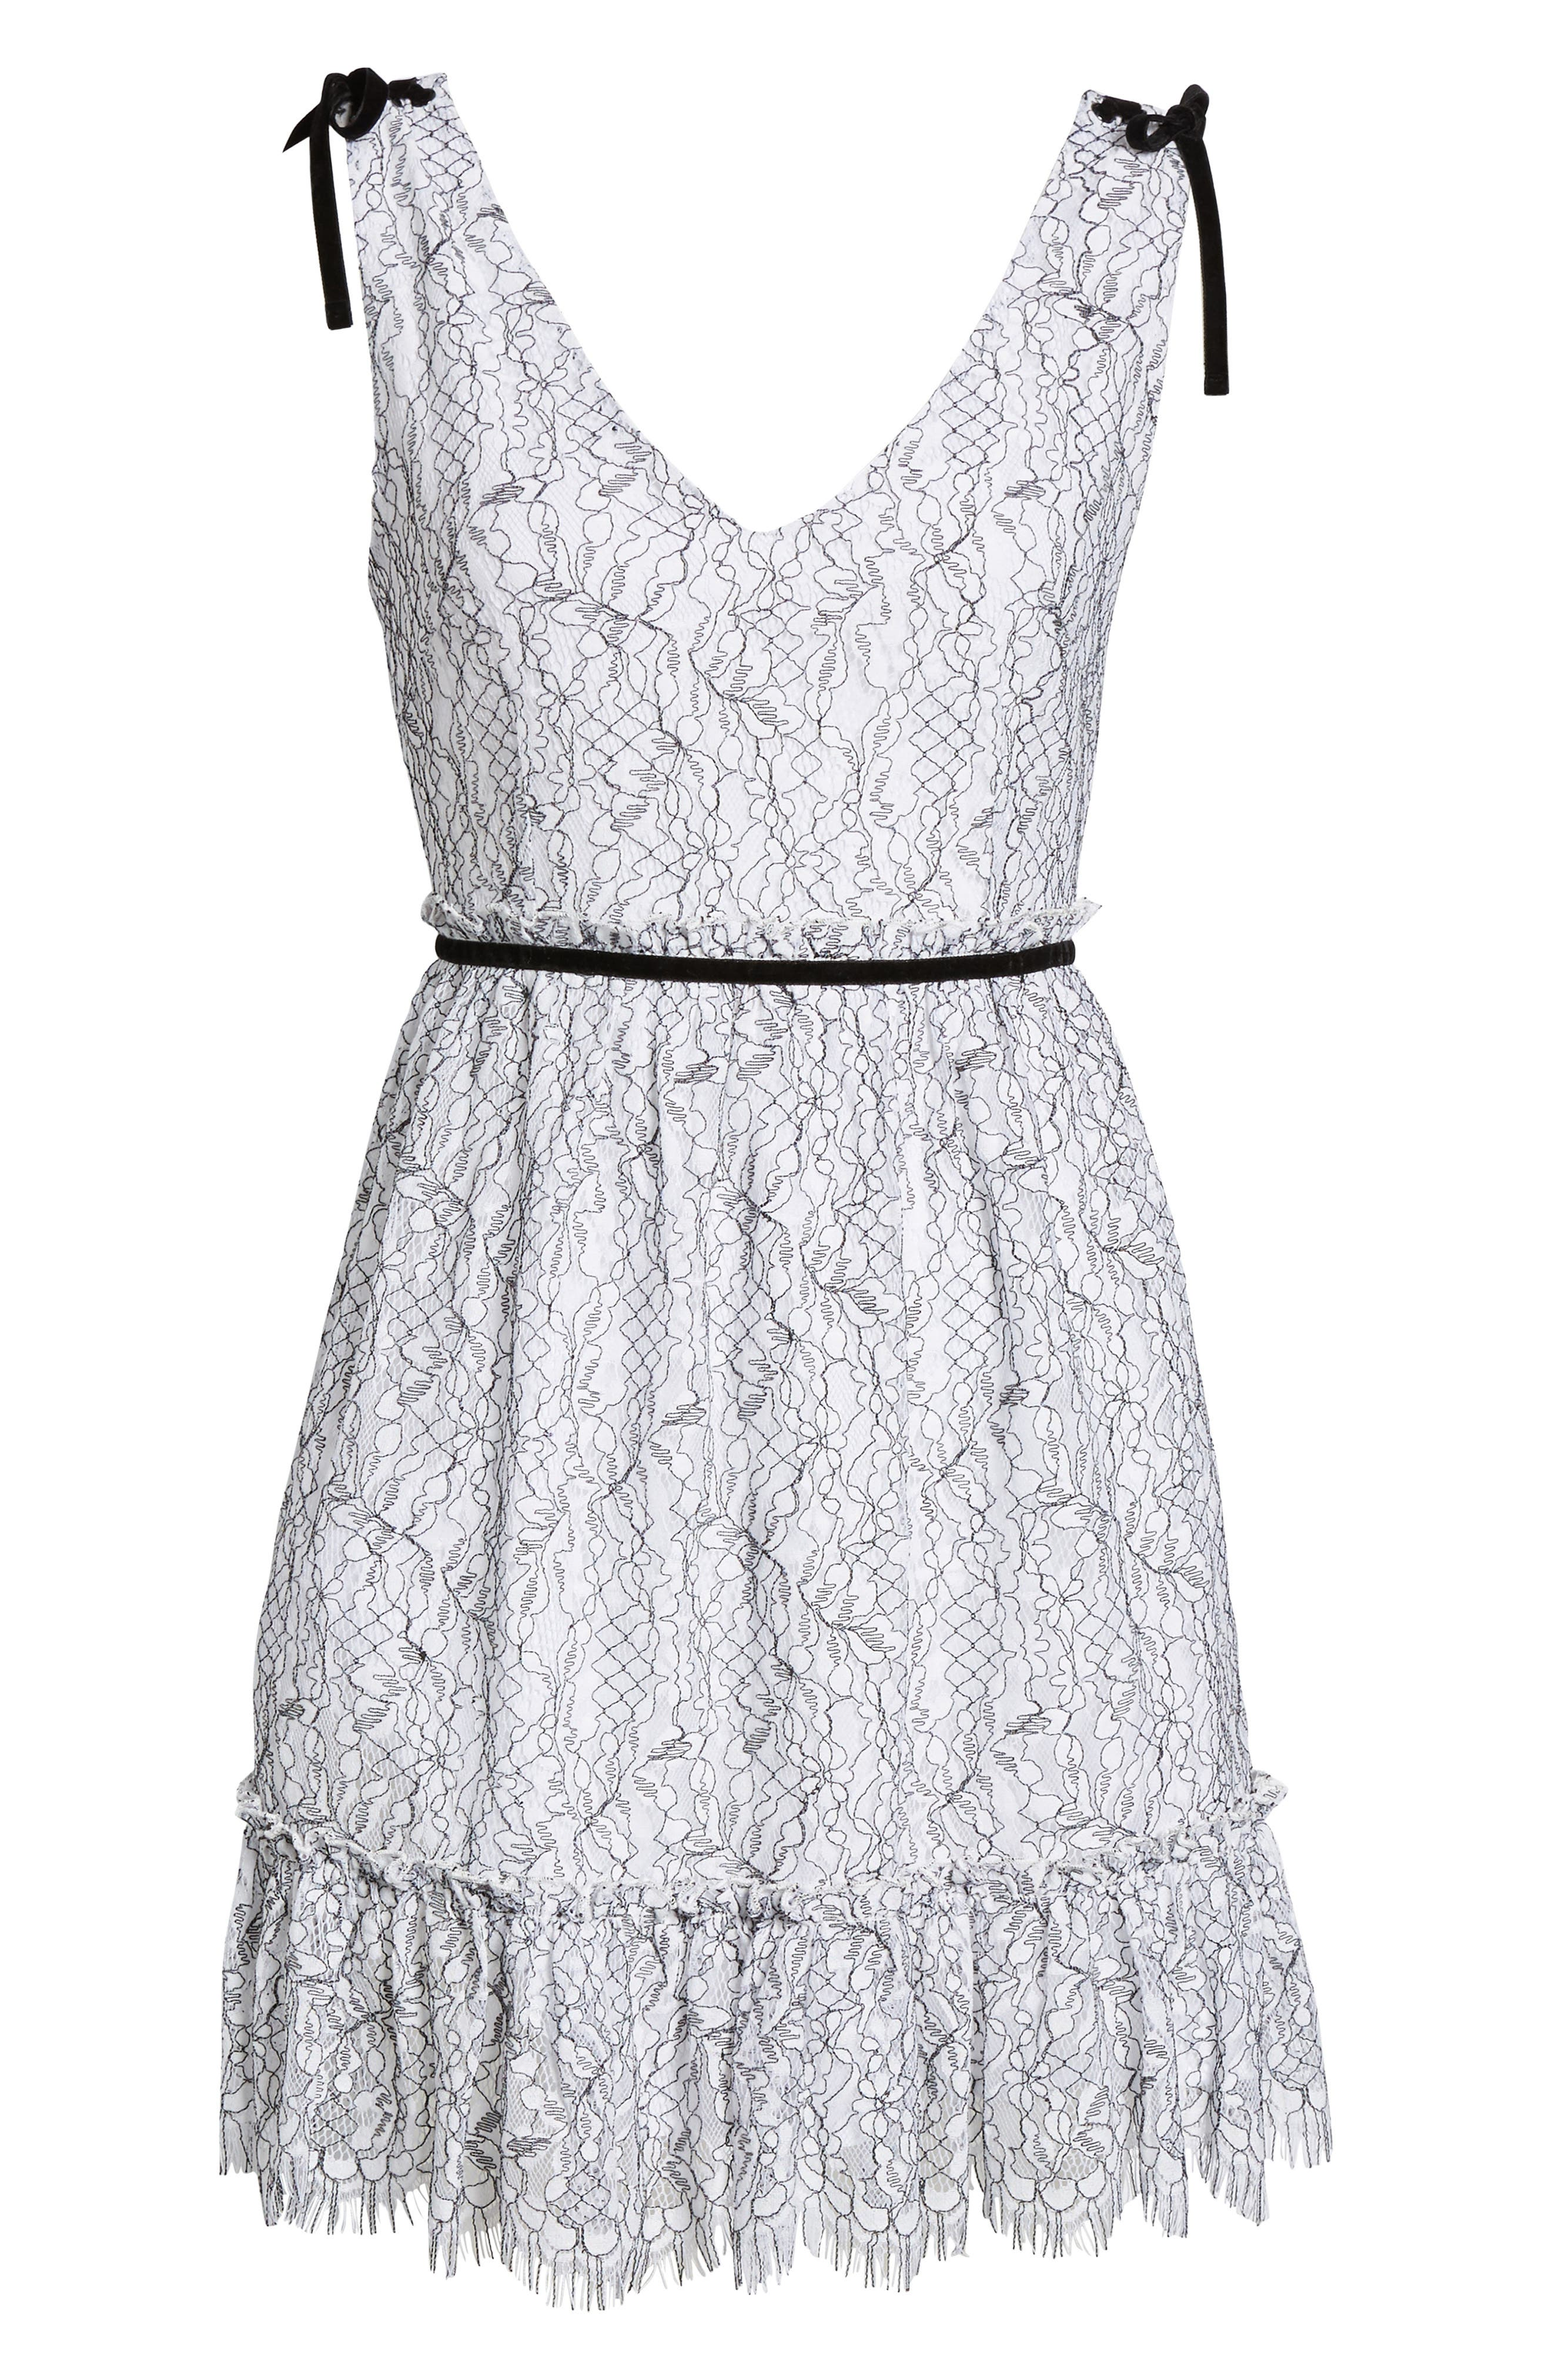 Ezzy Lace Dress,                             Alternate thumbnail 6, color,                             Ivory